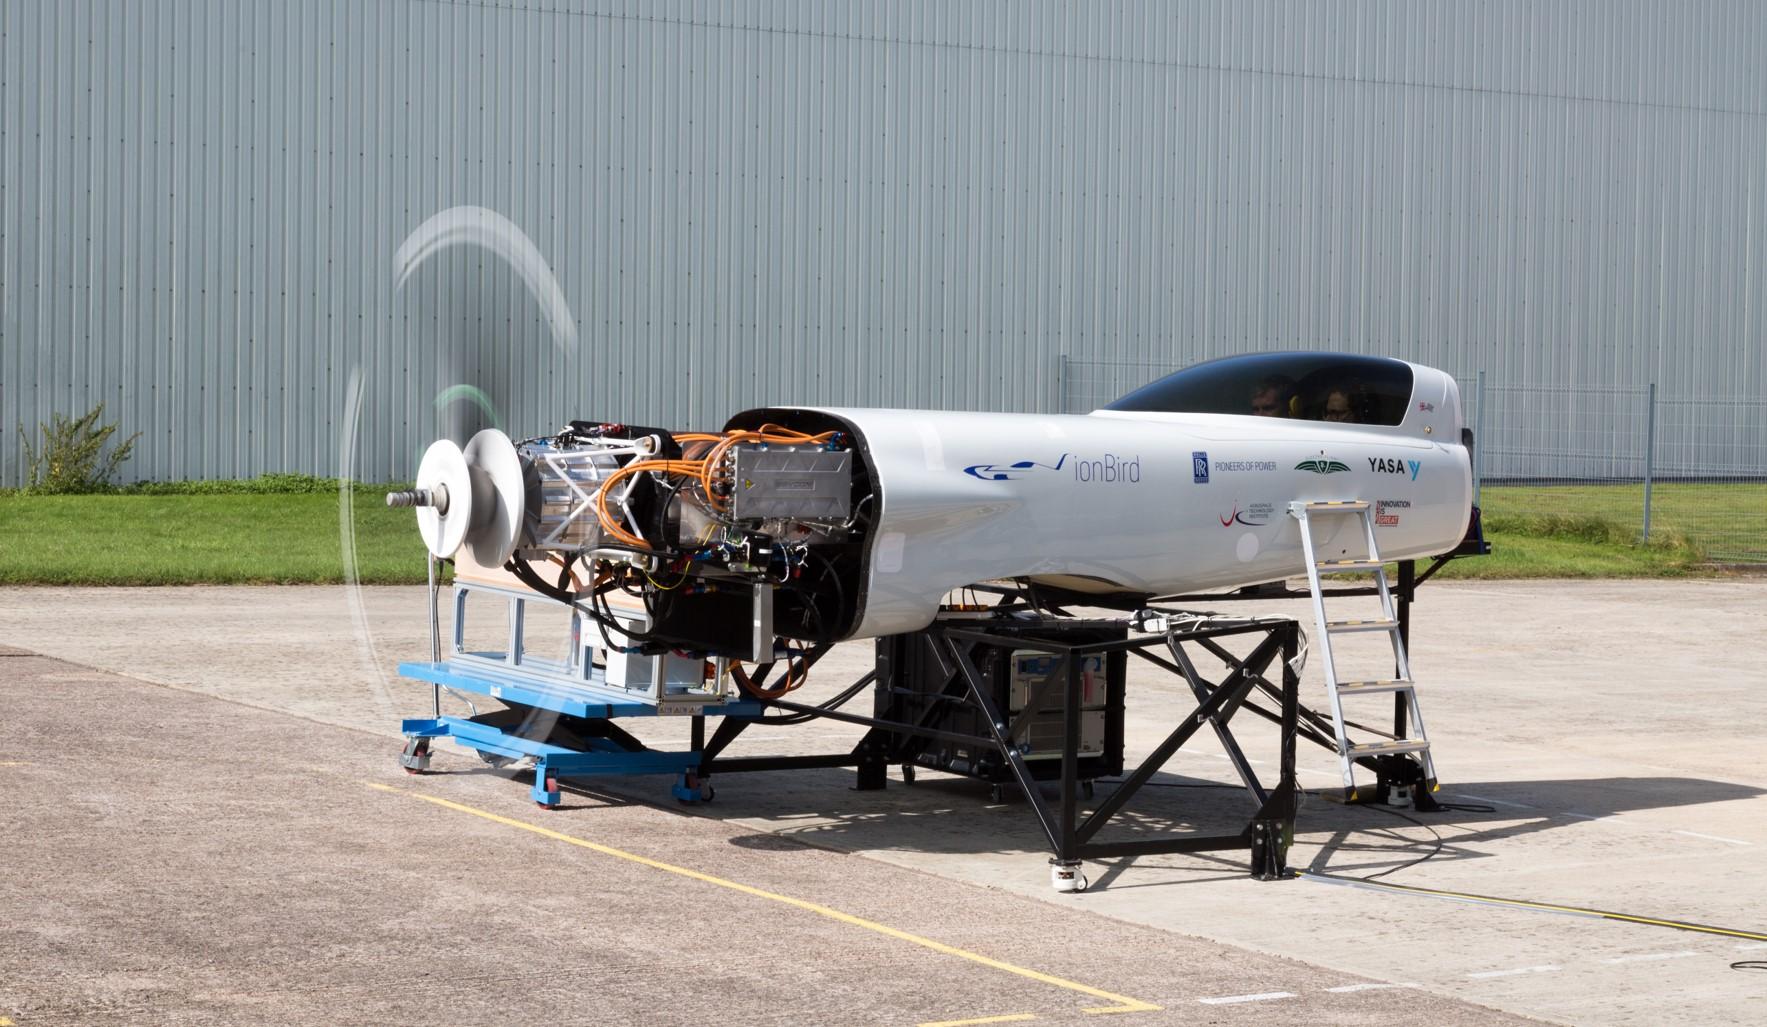 The ionBird testing rig